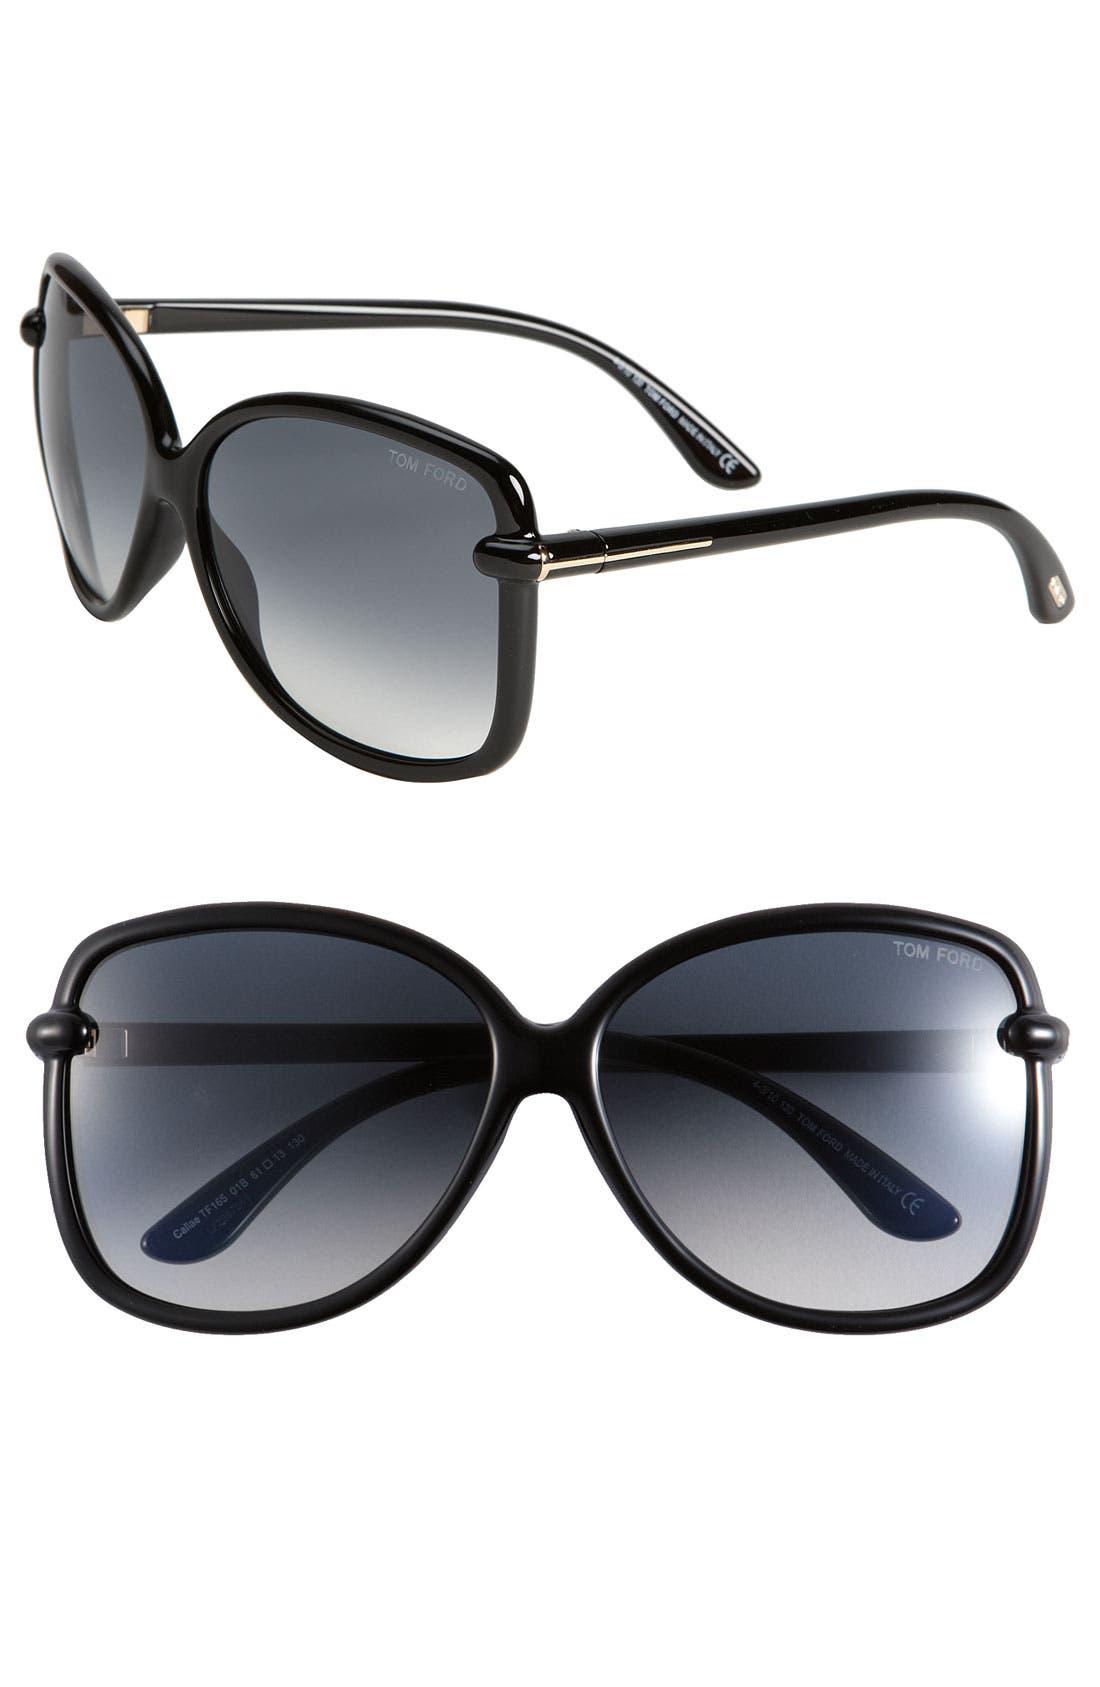 Main Image - Tom Ford 'Callae' Sunglasses